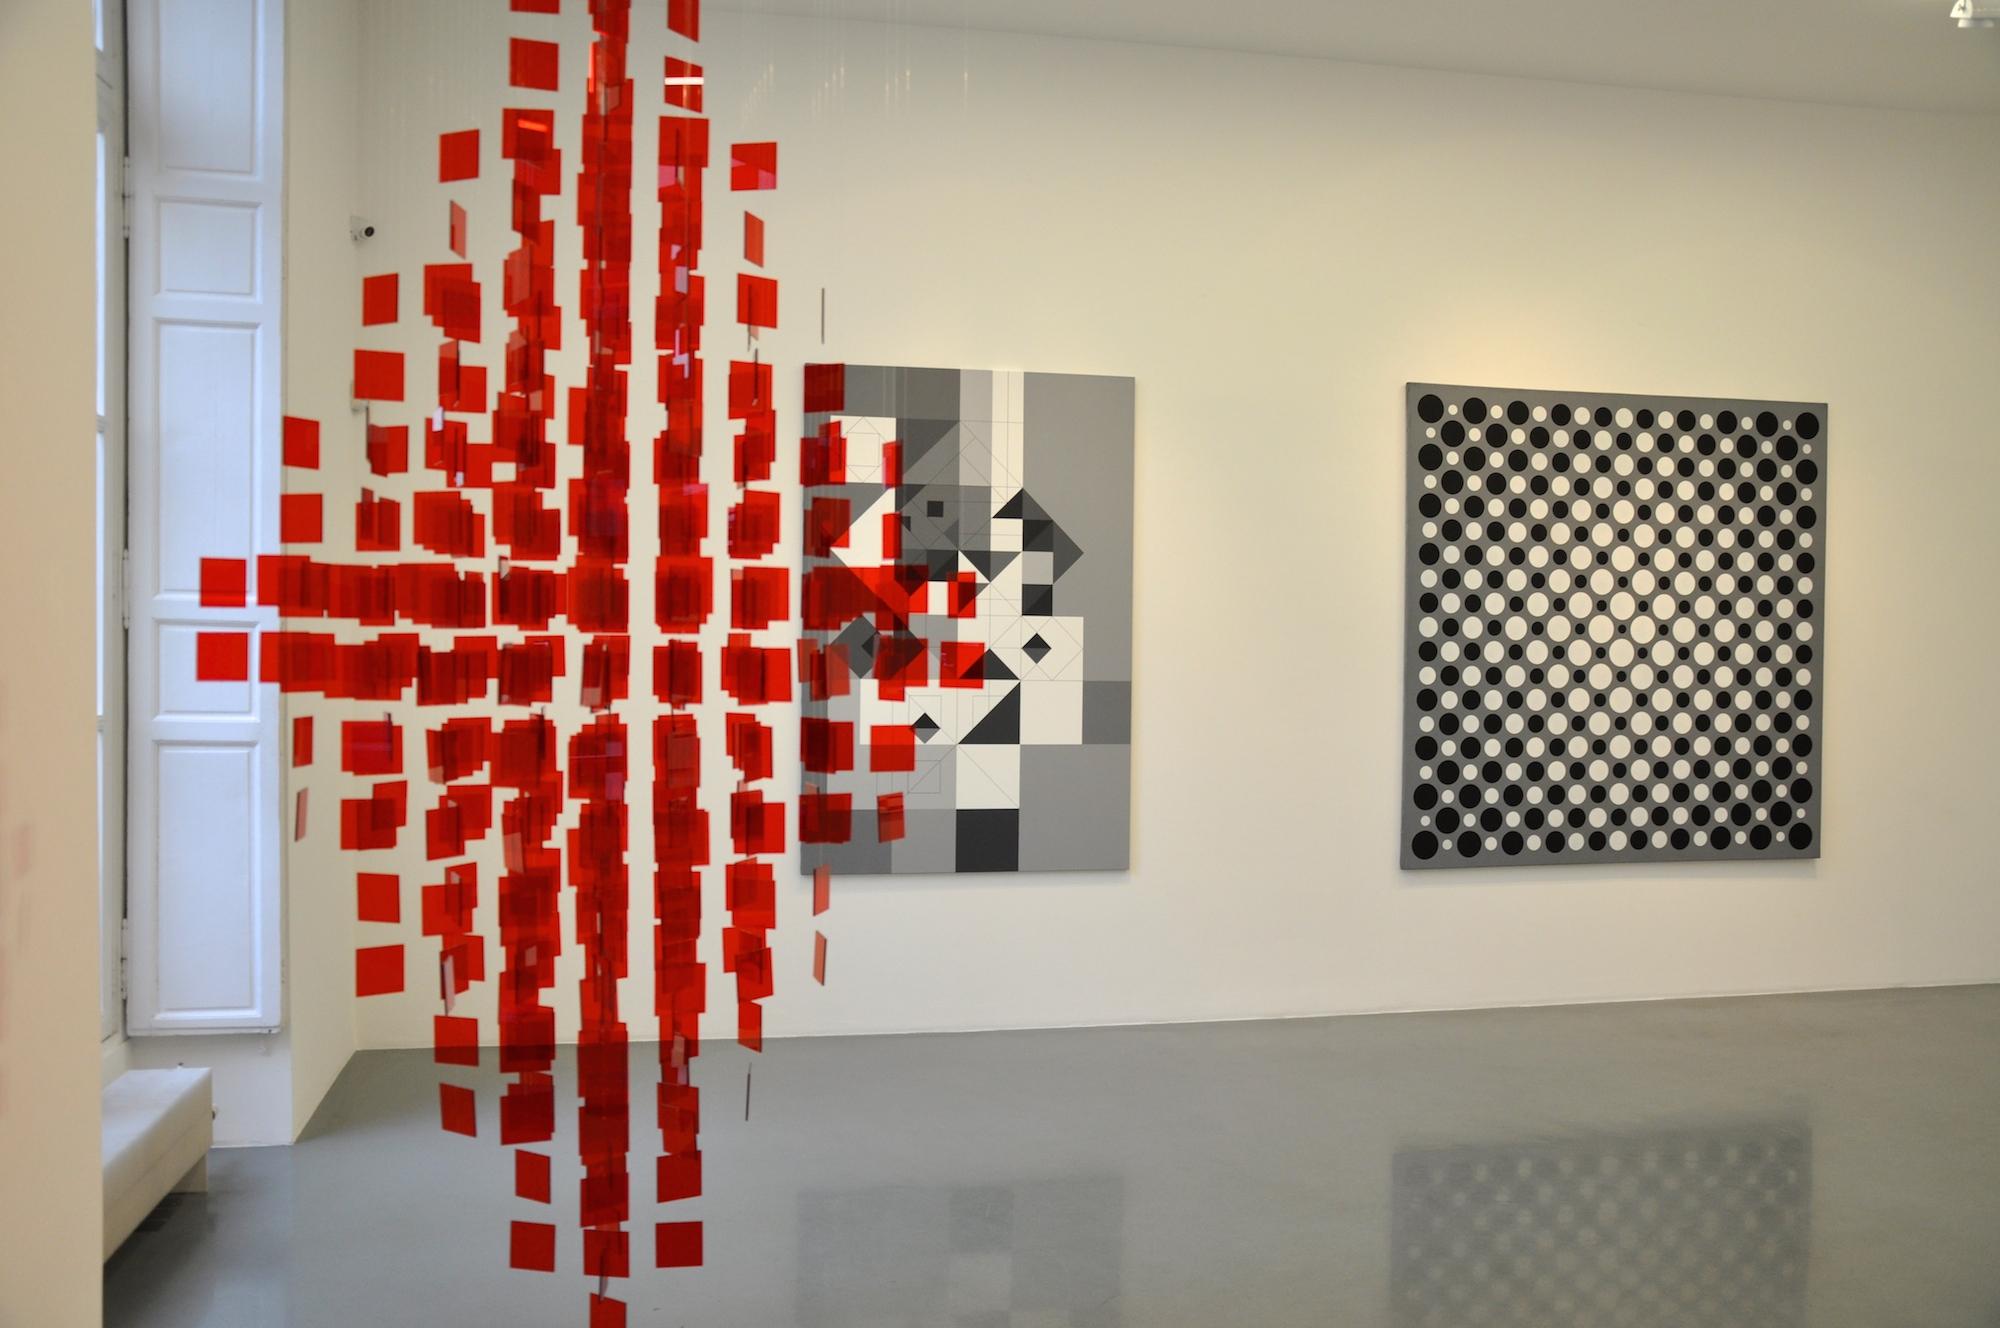 HiP Paris Blog rounds up the best art galleries off the beaten track